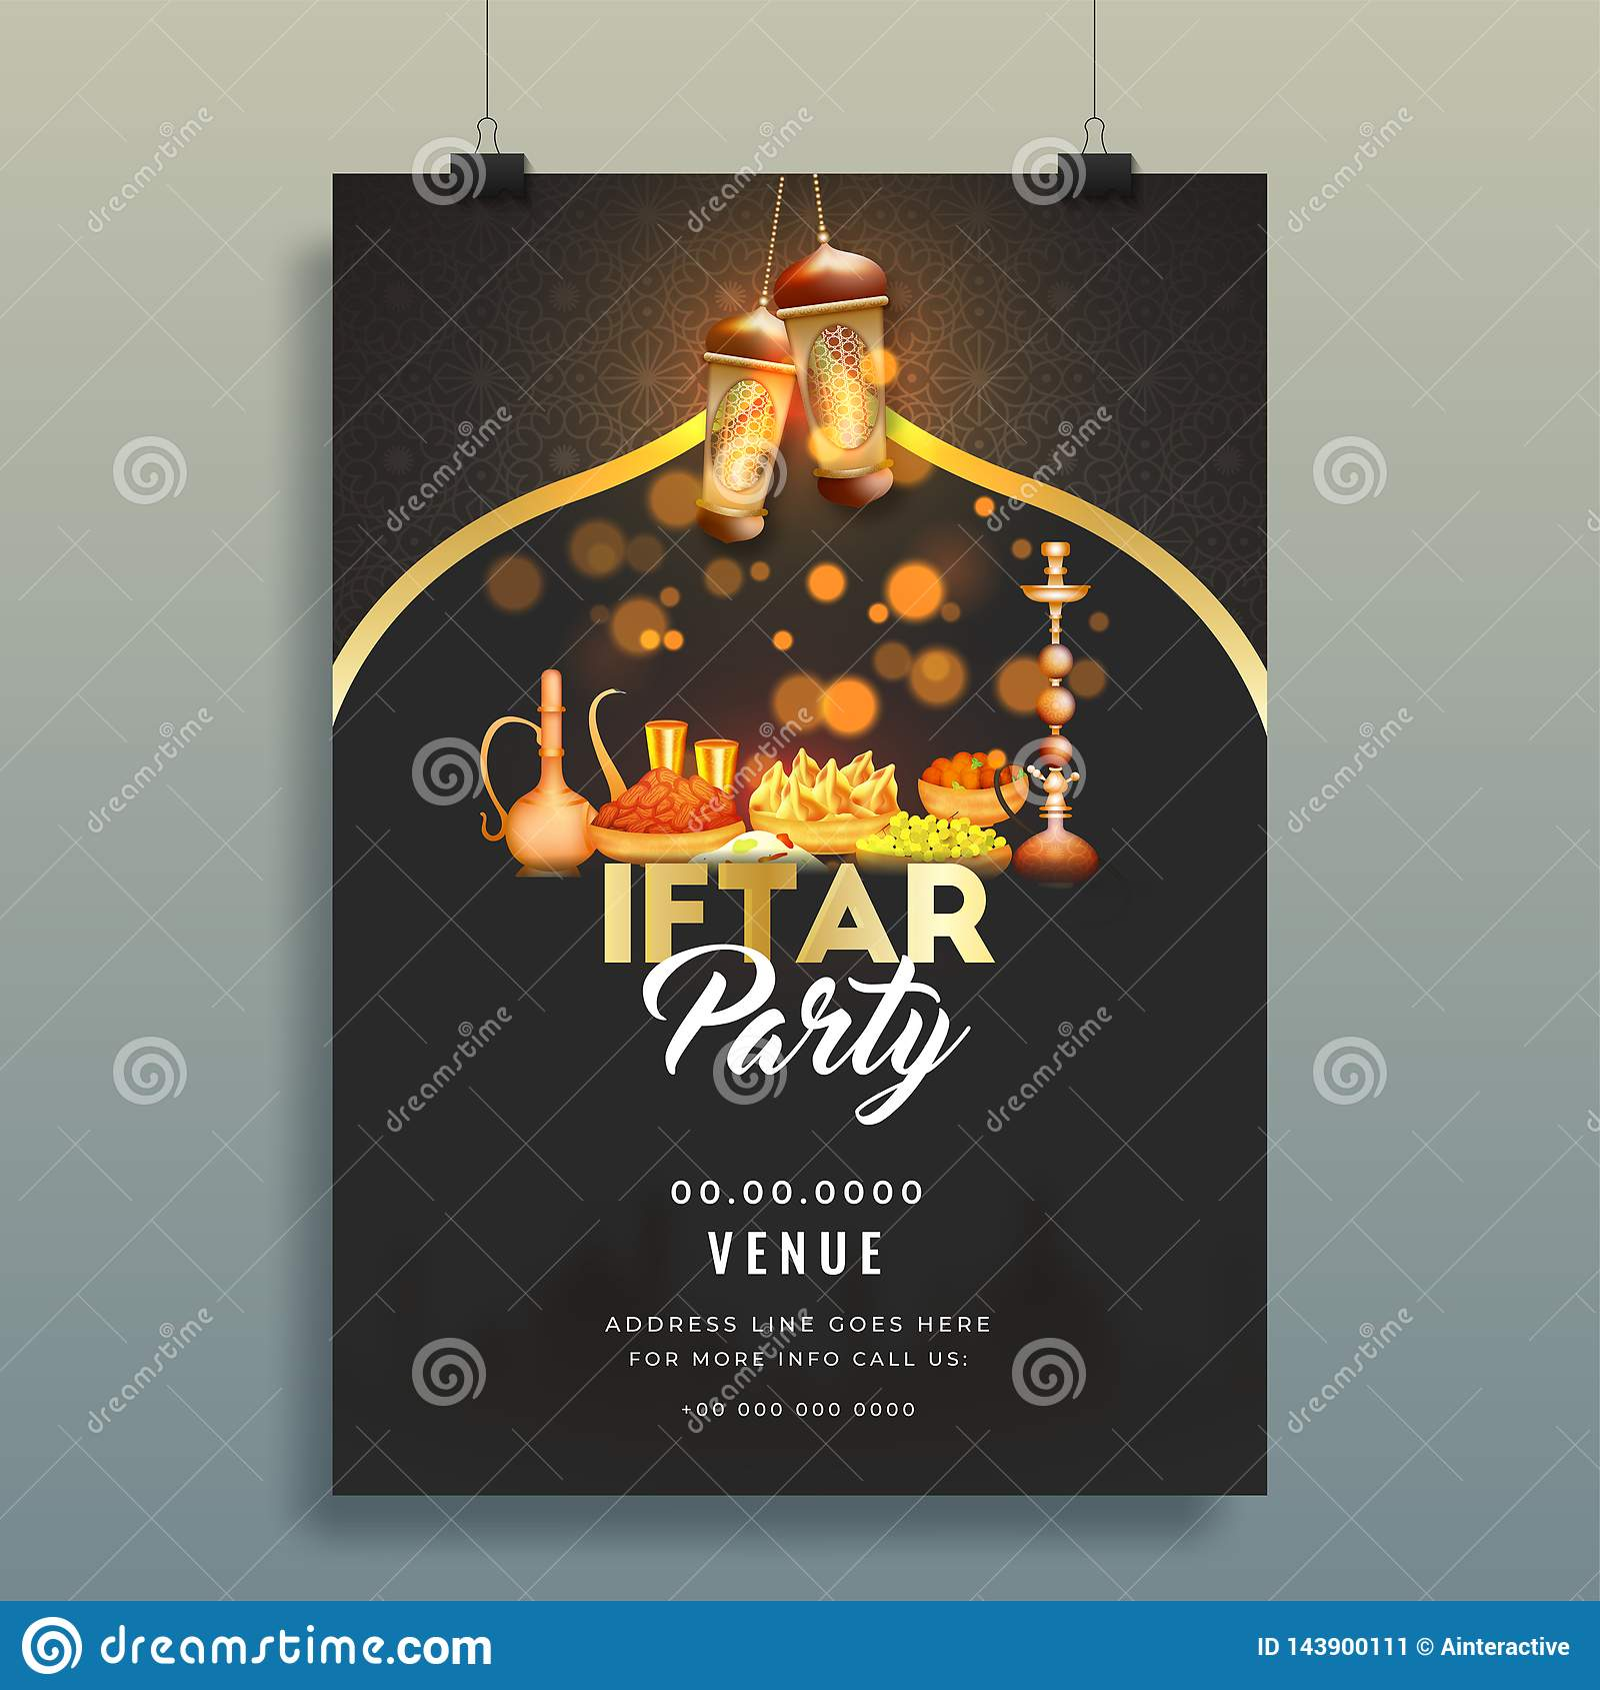 creative invitation card design with venue details